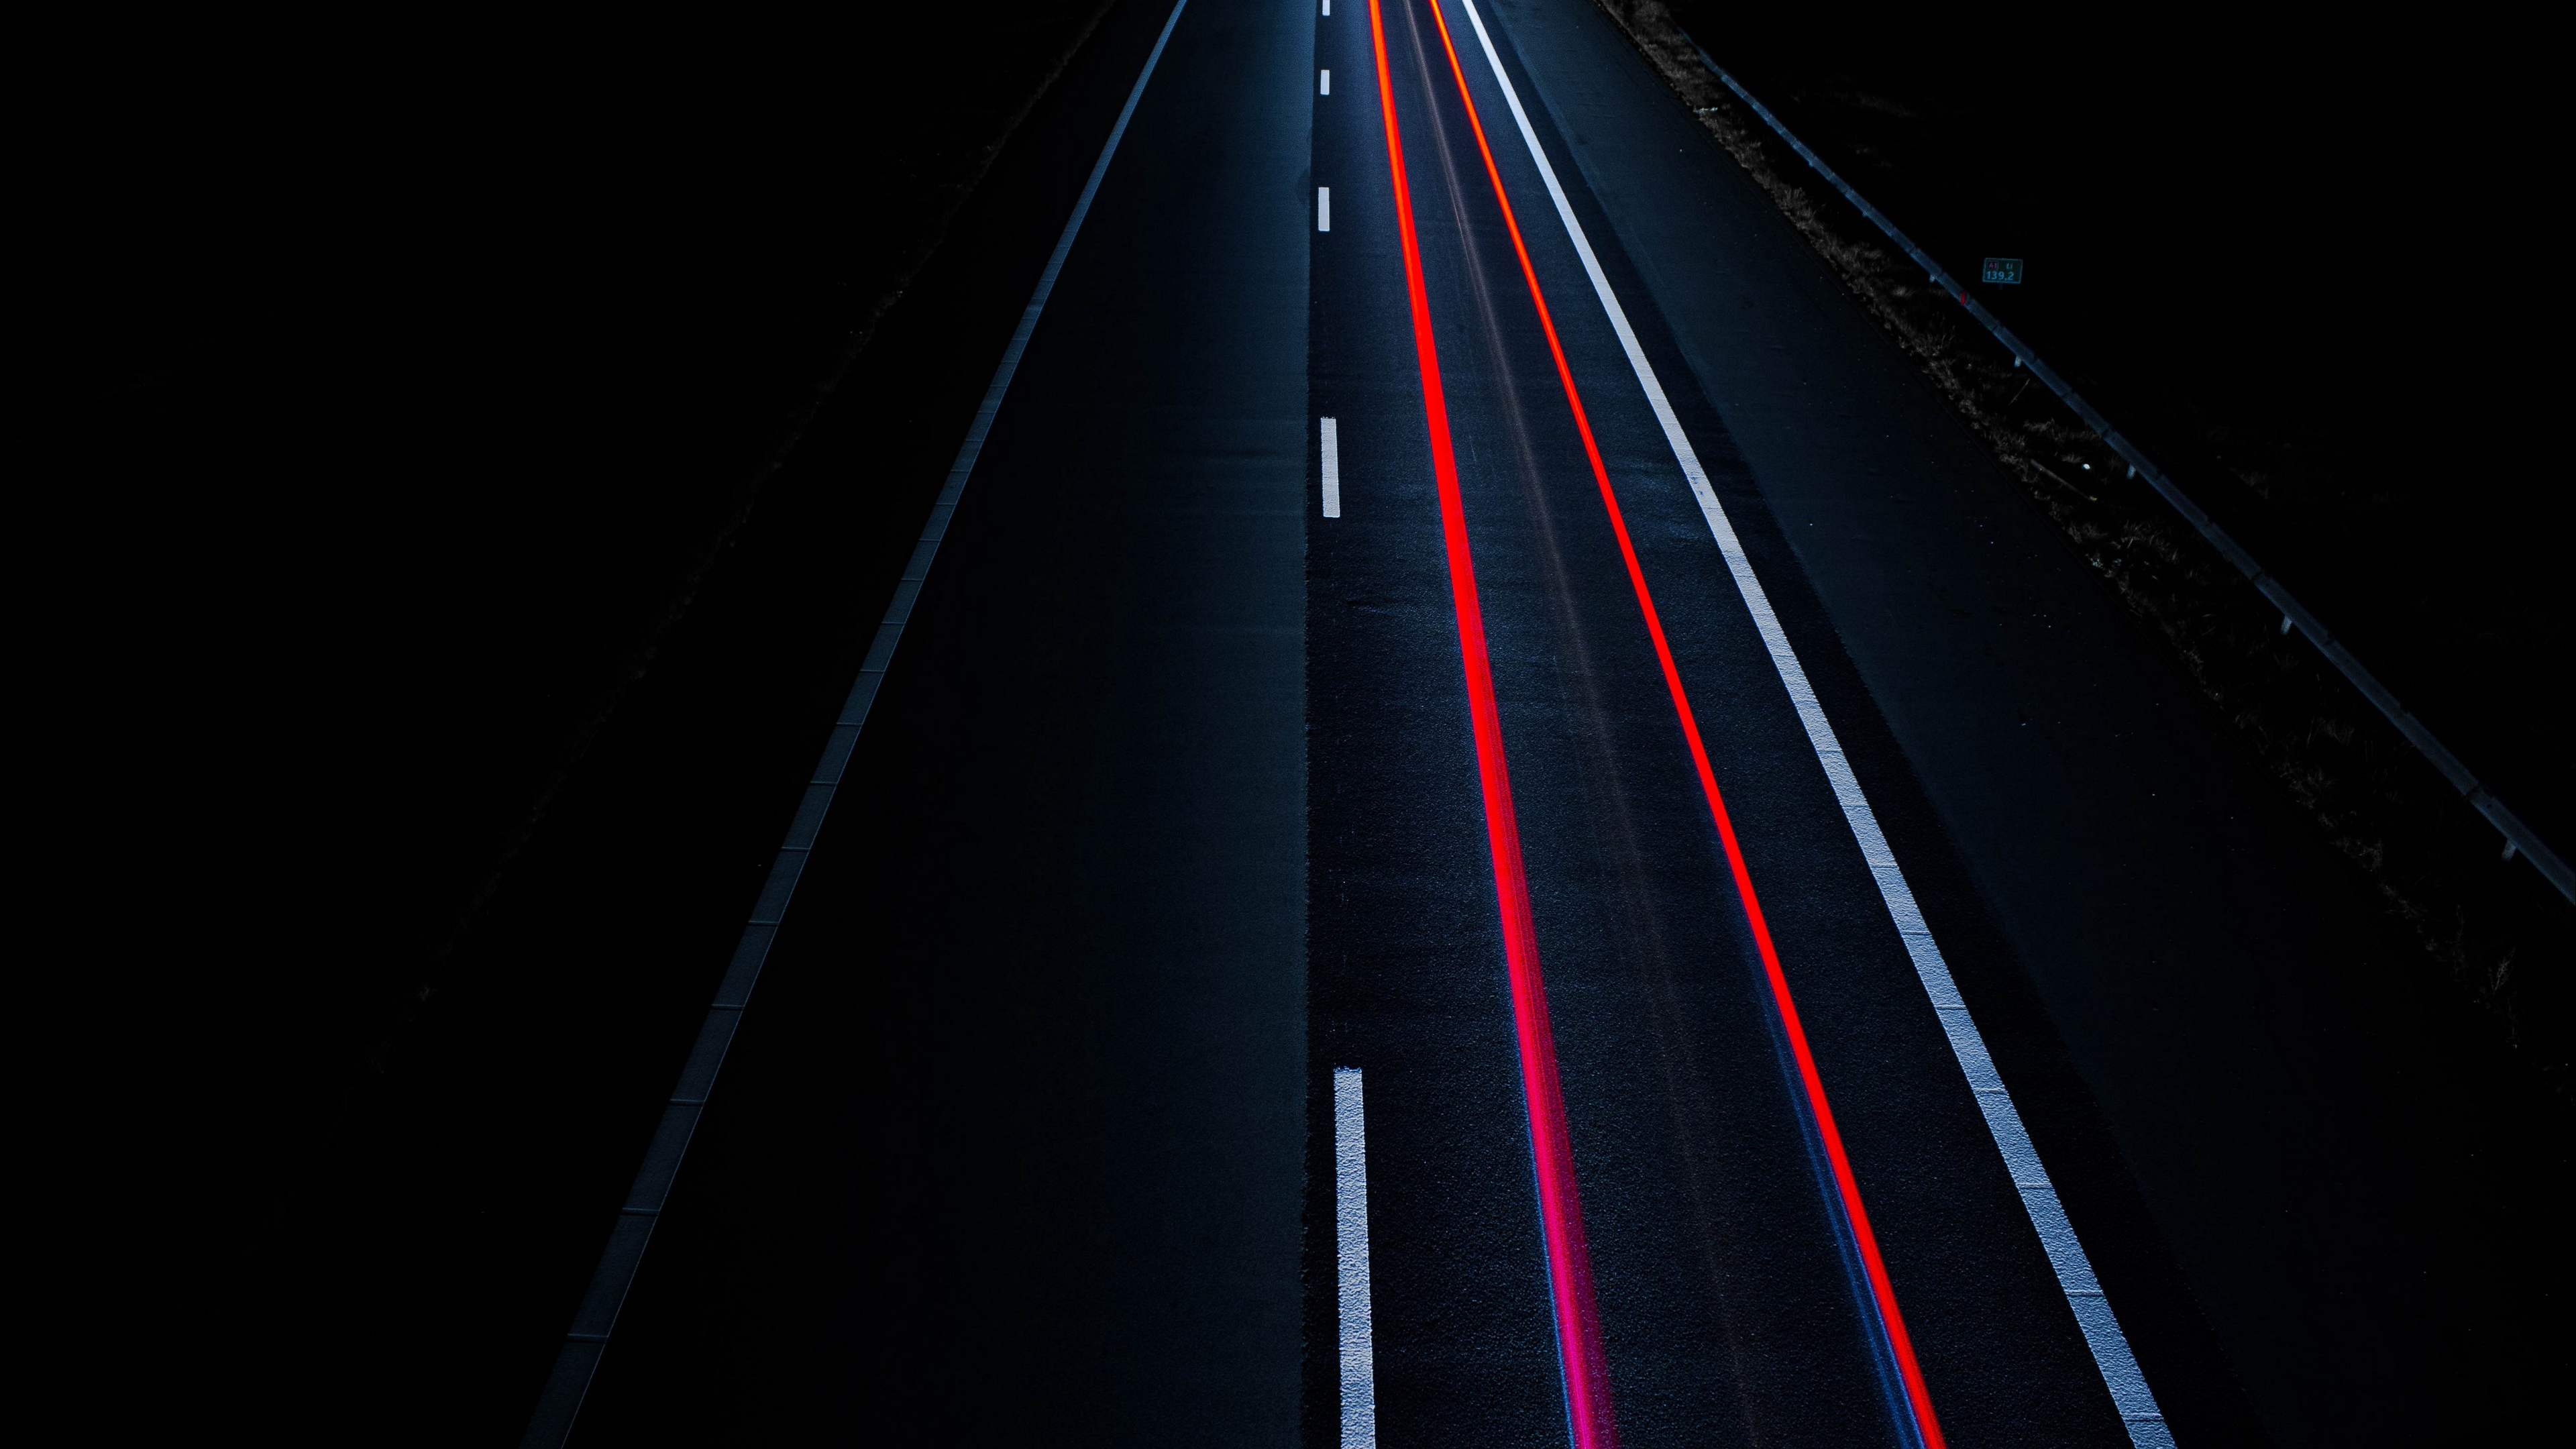 road light lines marking 4k 1536017755 - road, light, lines, marking 4k - Road, Lines, Light